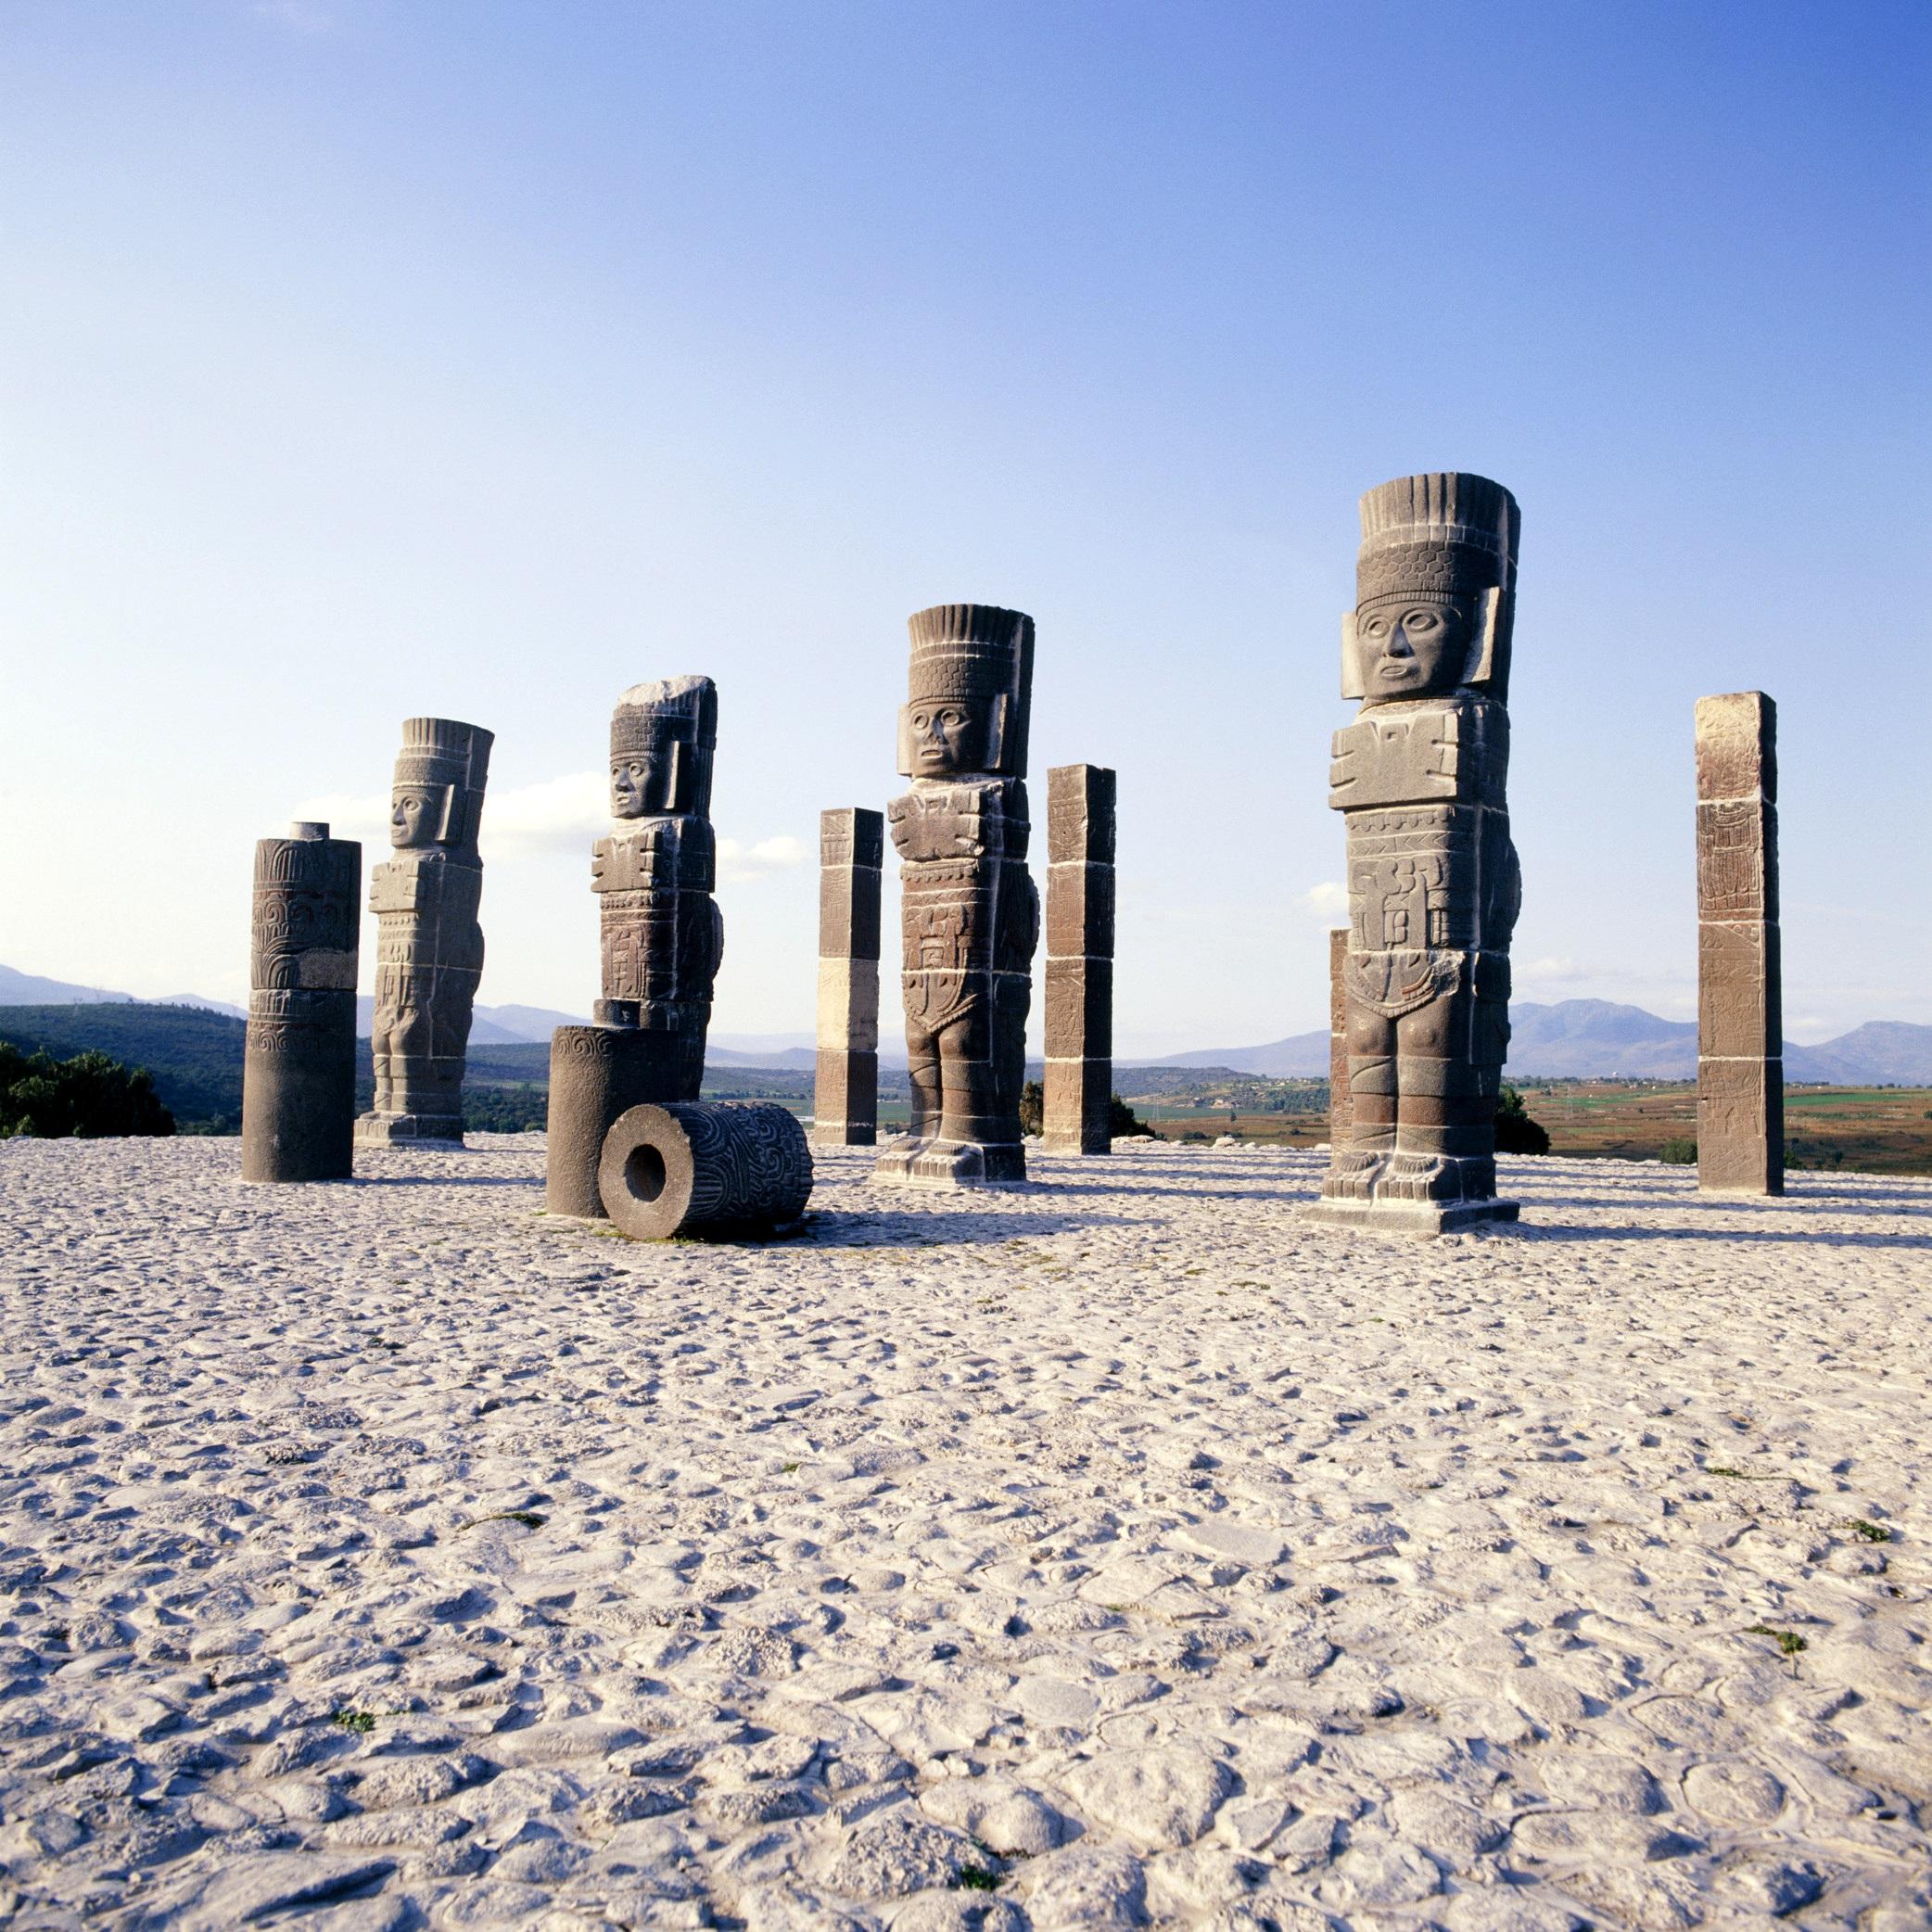 Zona Arqueológica de Tula - Tula de Allende